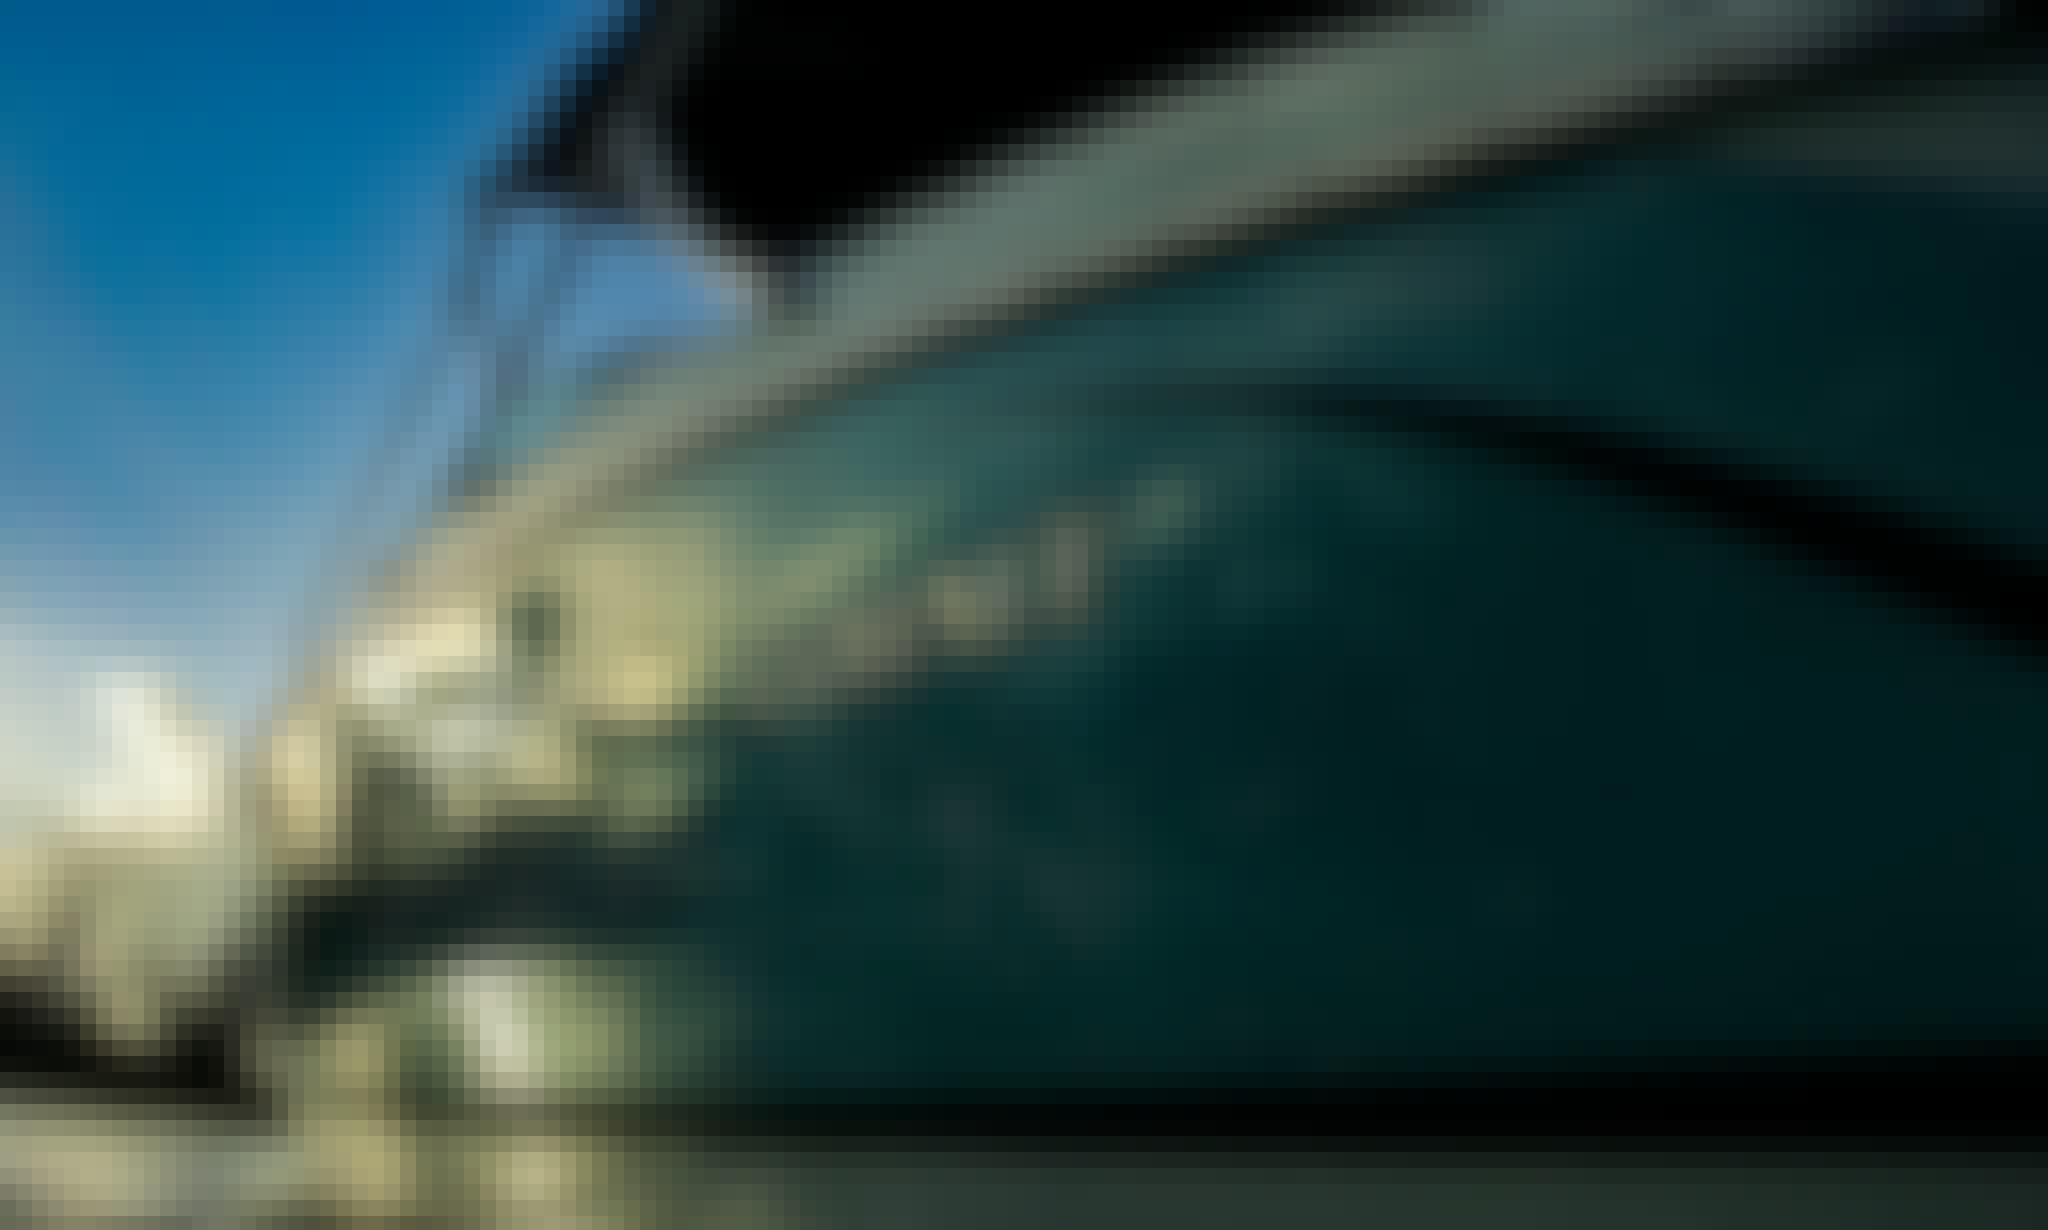 Cobalt R5 Bowrider Boat Rental In West Bay, Cayman Islands